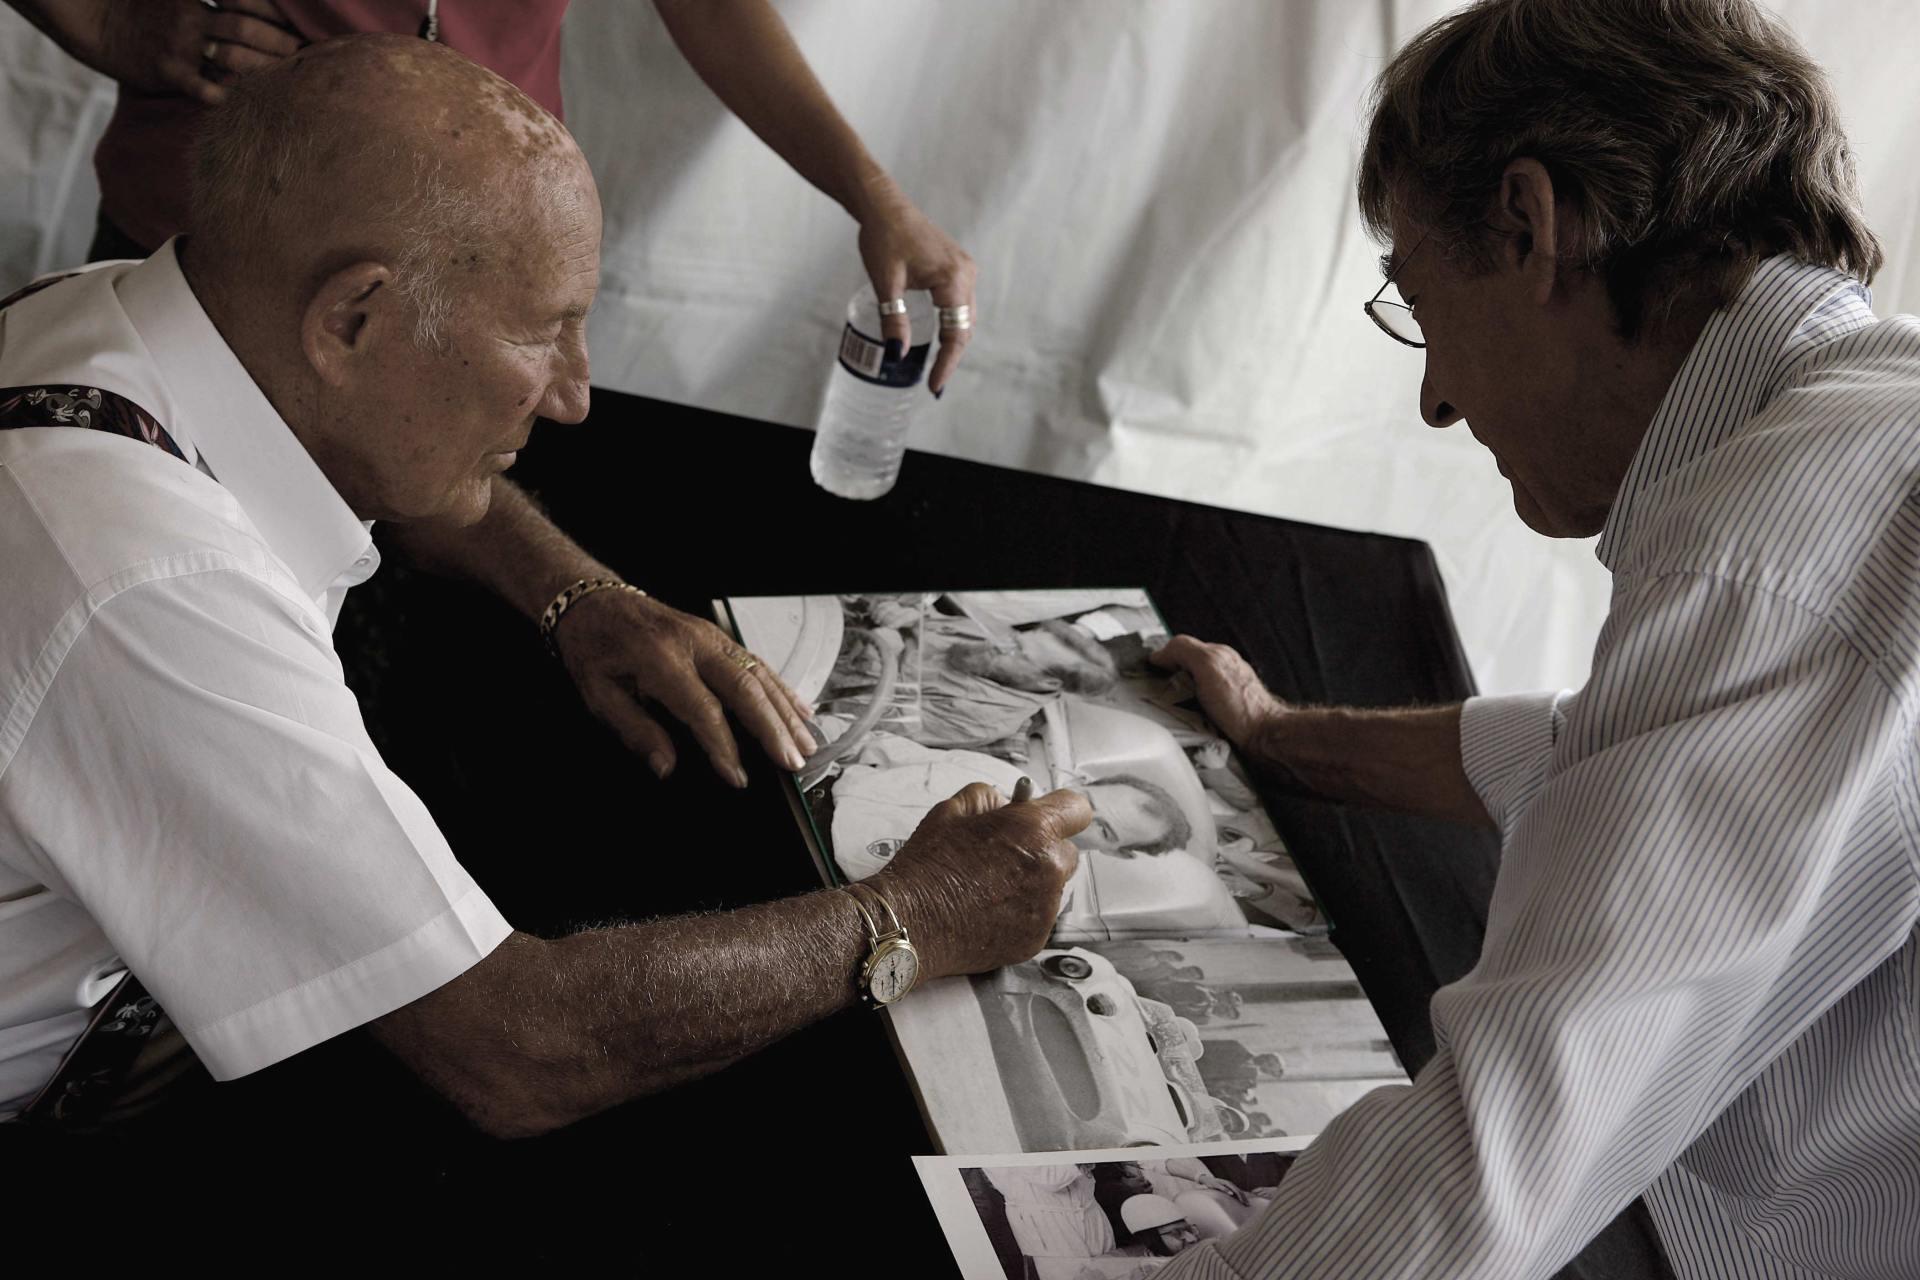 Sir Stirling Moss signs memorabilia.